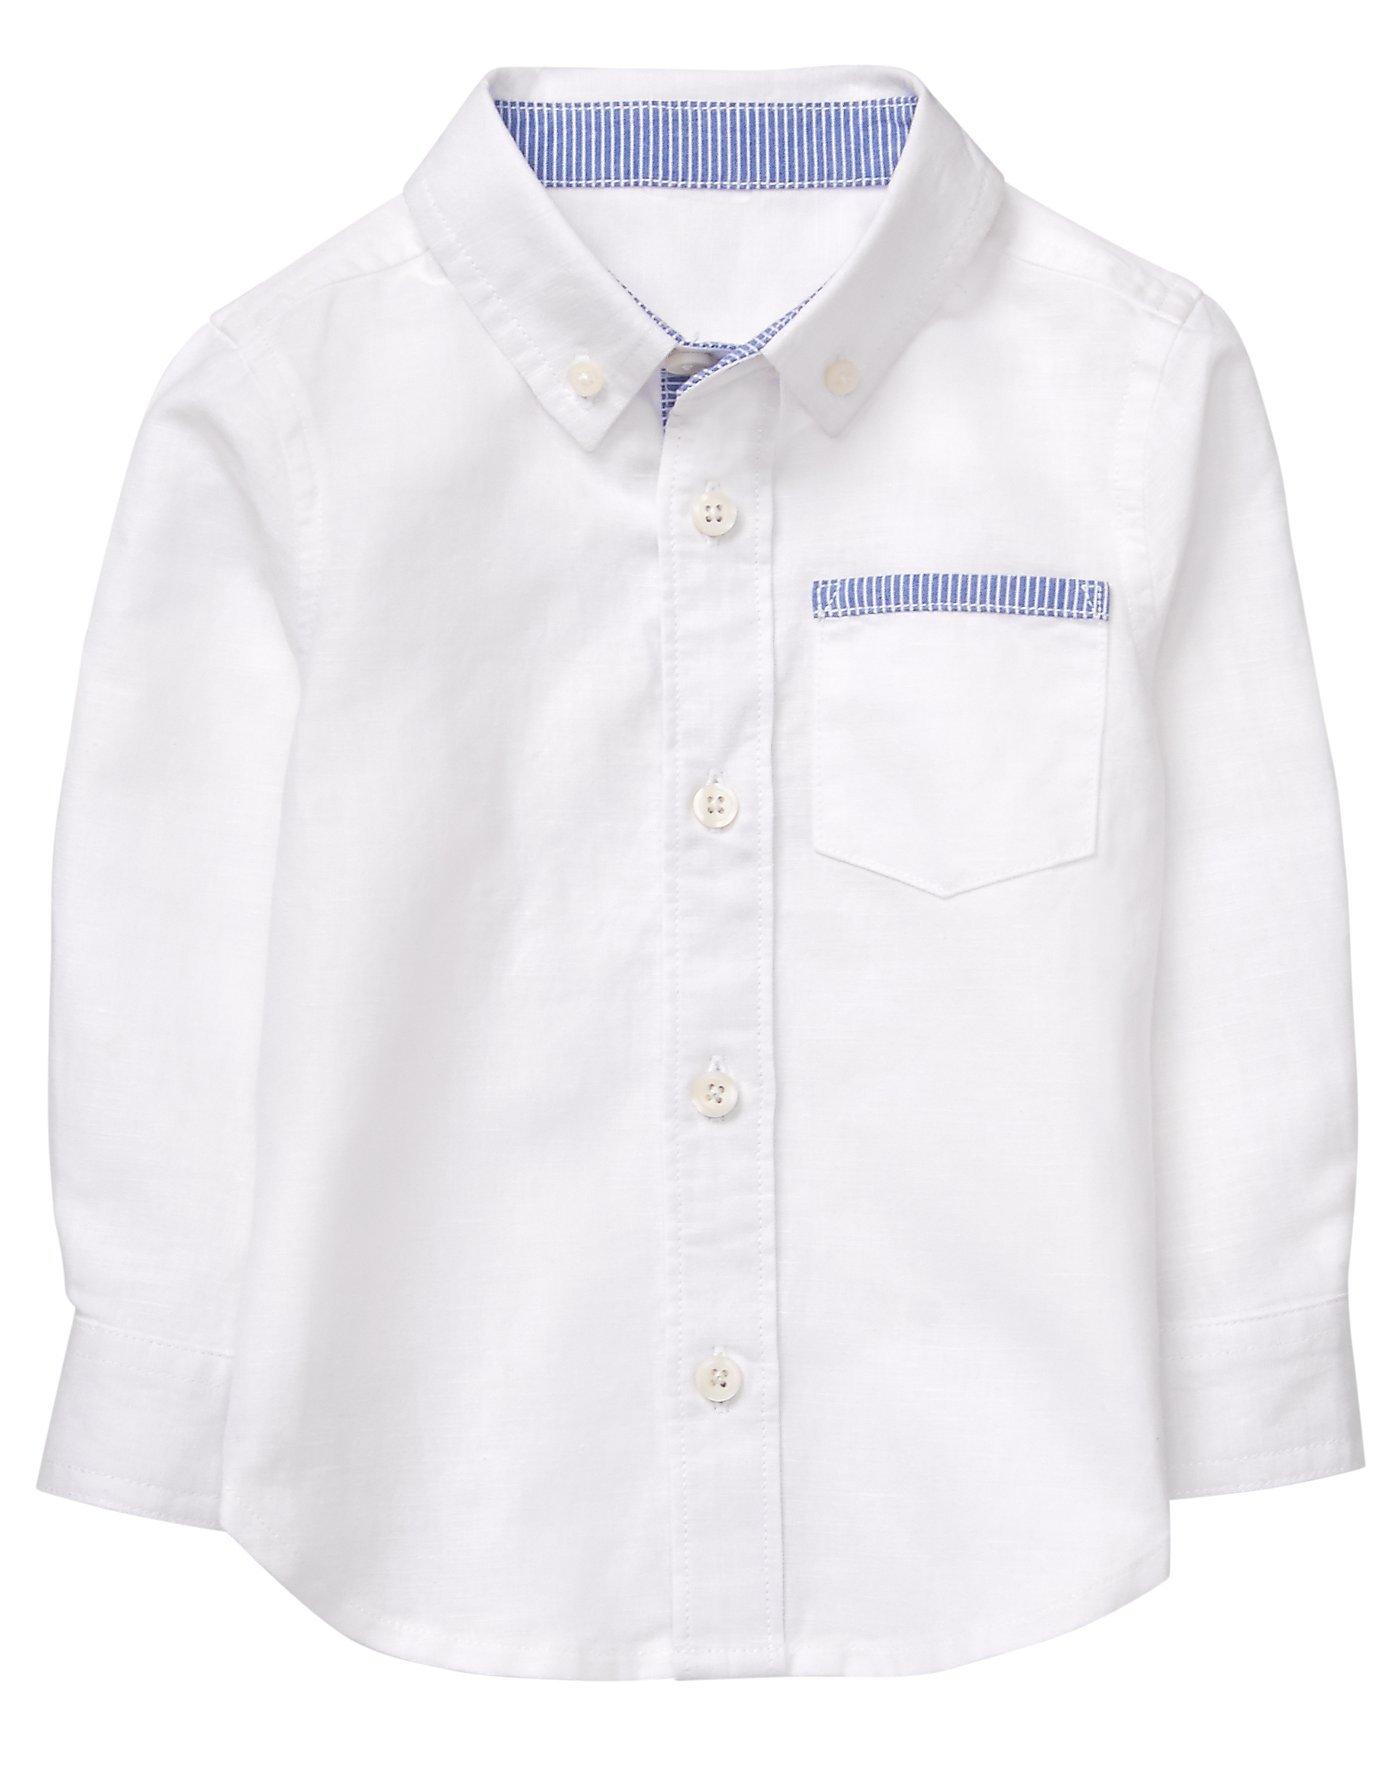 Gymboree Baby Boys Long Sleeve Button up Shirt, White, 18-24 Mo by Gymboree (Image #1)